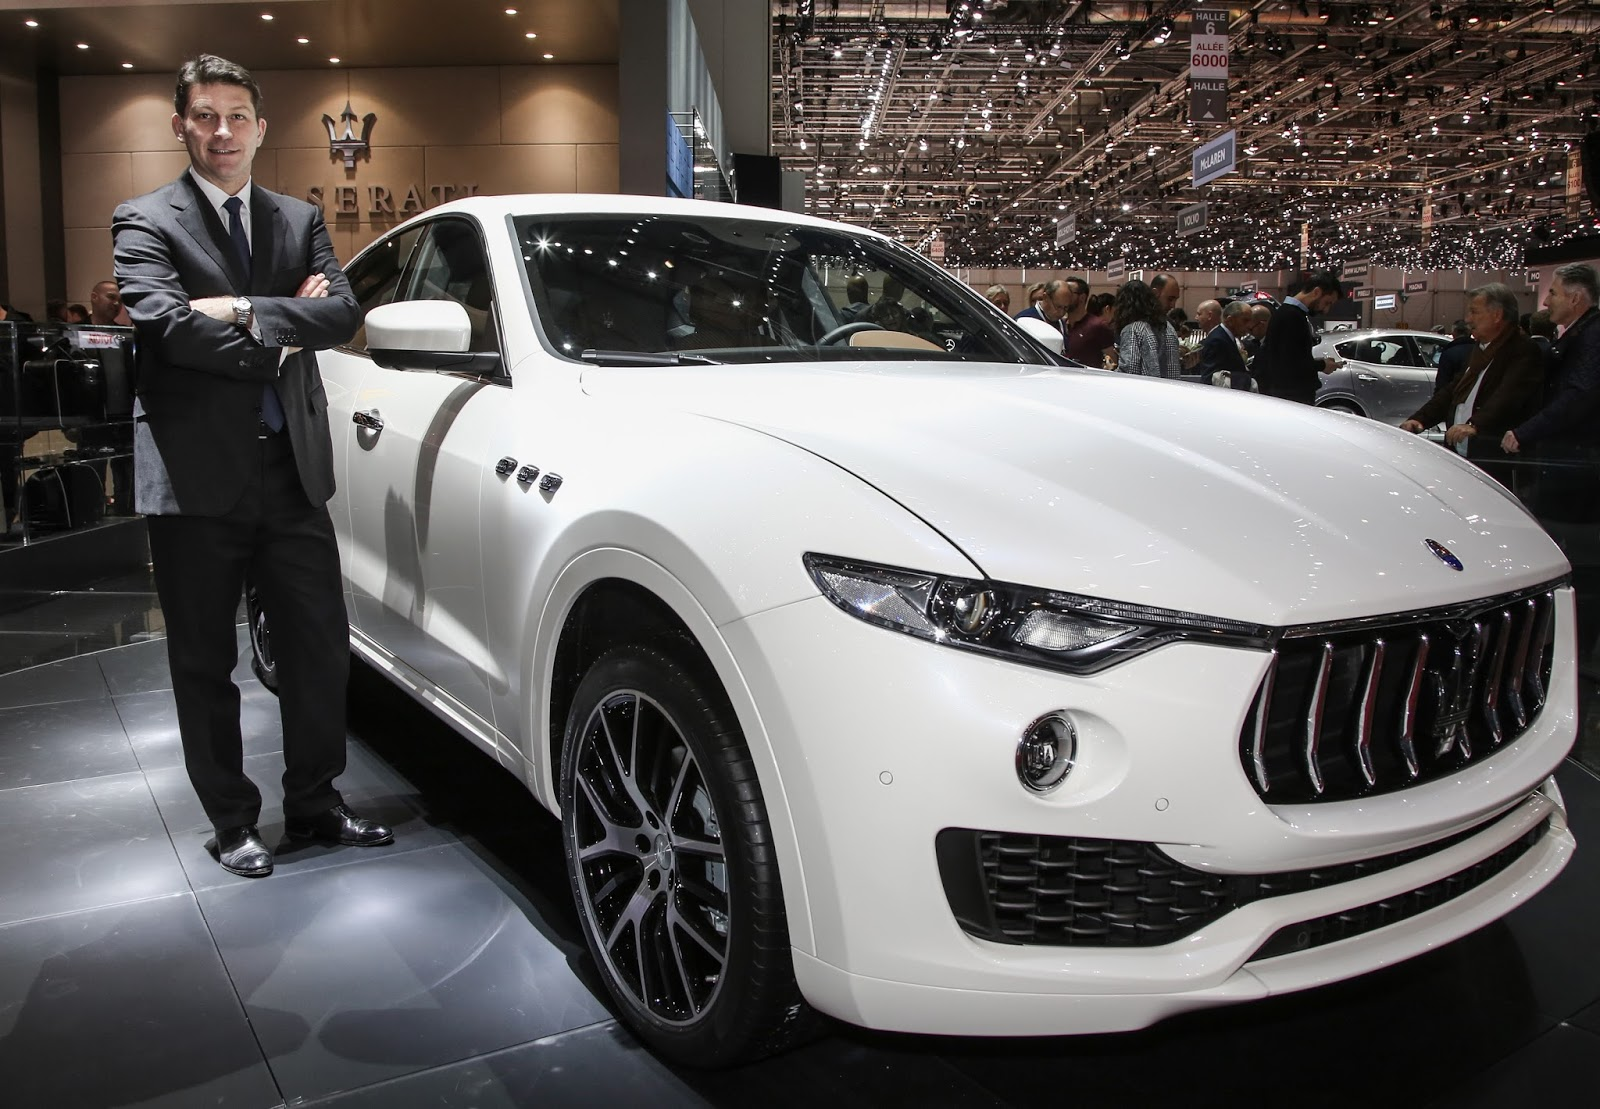 56d6f5961d01c Τα πάντα για το πρώτο SUV της Maserati autoshow, Maserati, Maserati Ghibli, Maserati Ghibli S, Maserati Ghibli S Q4, Maserati GranTurismo, Maserati Levante, Maserati Levante S, Maserati Quattroporte, zblog